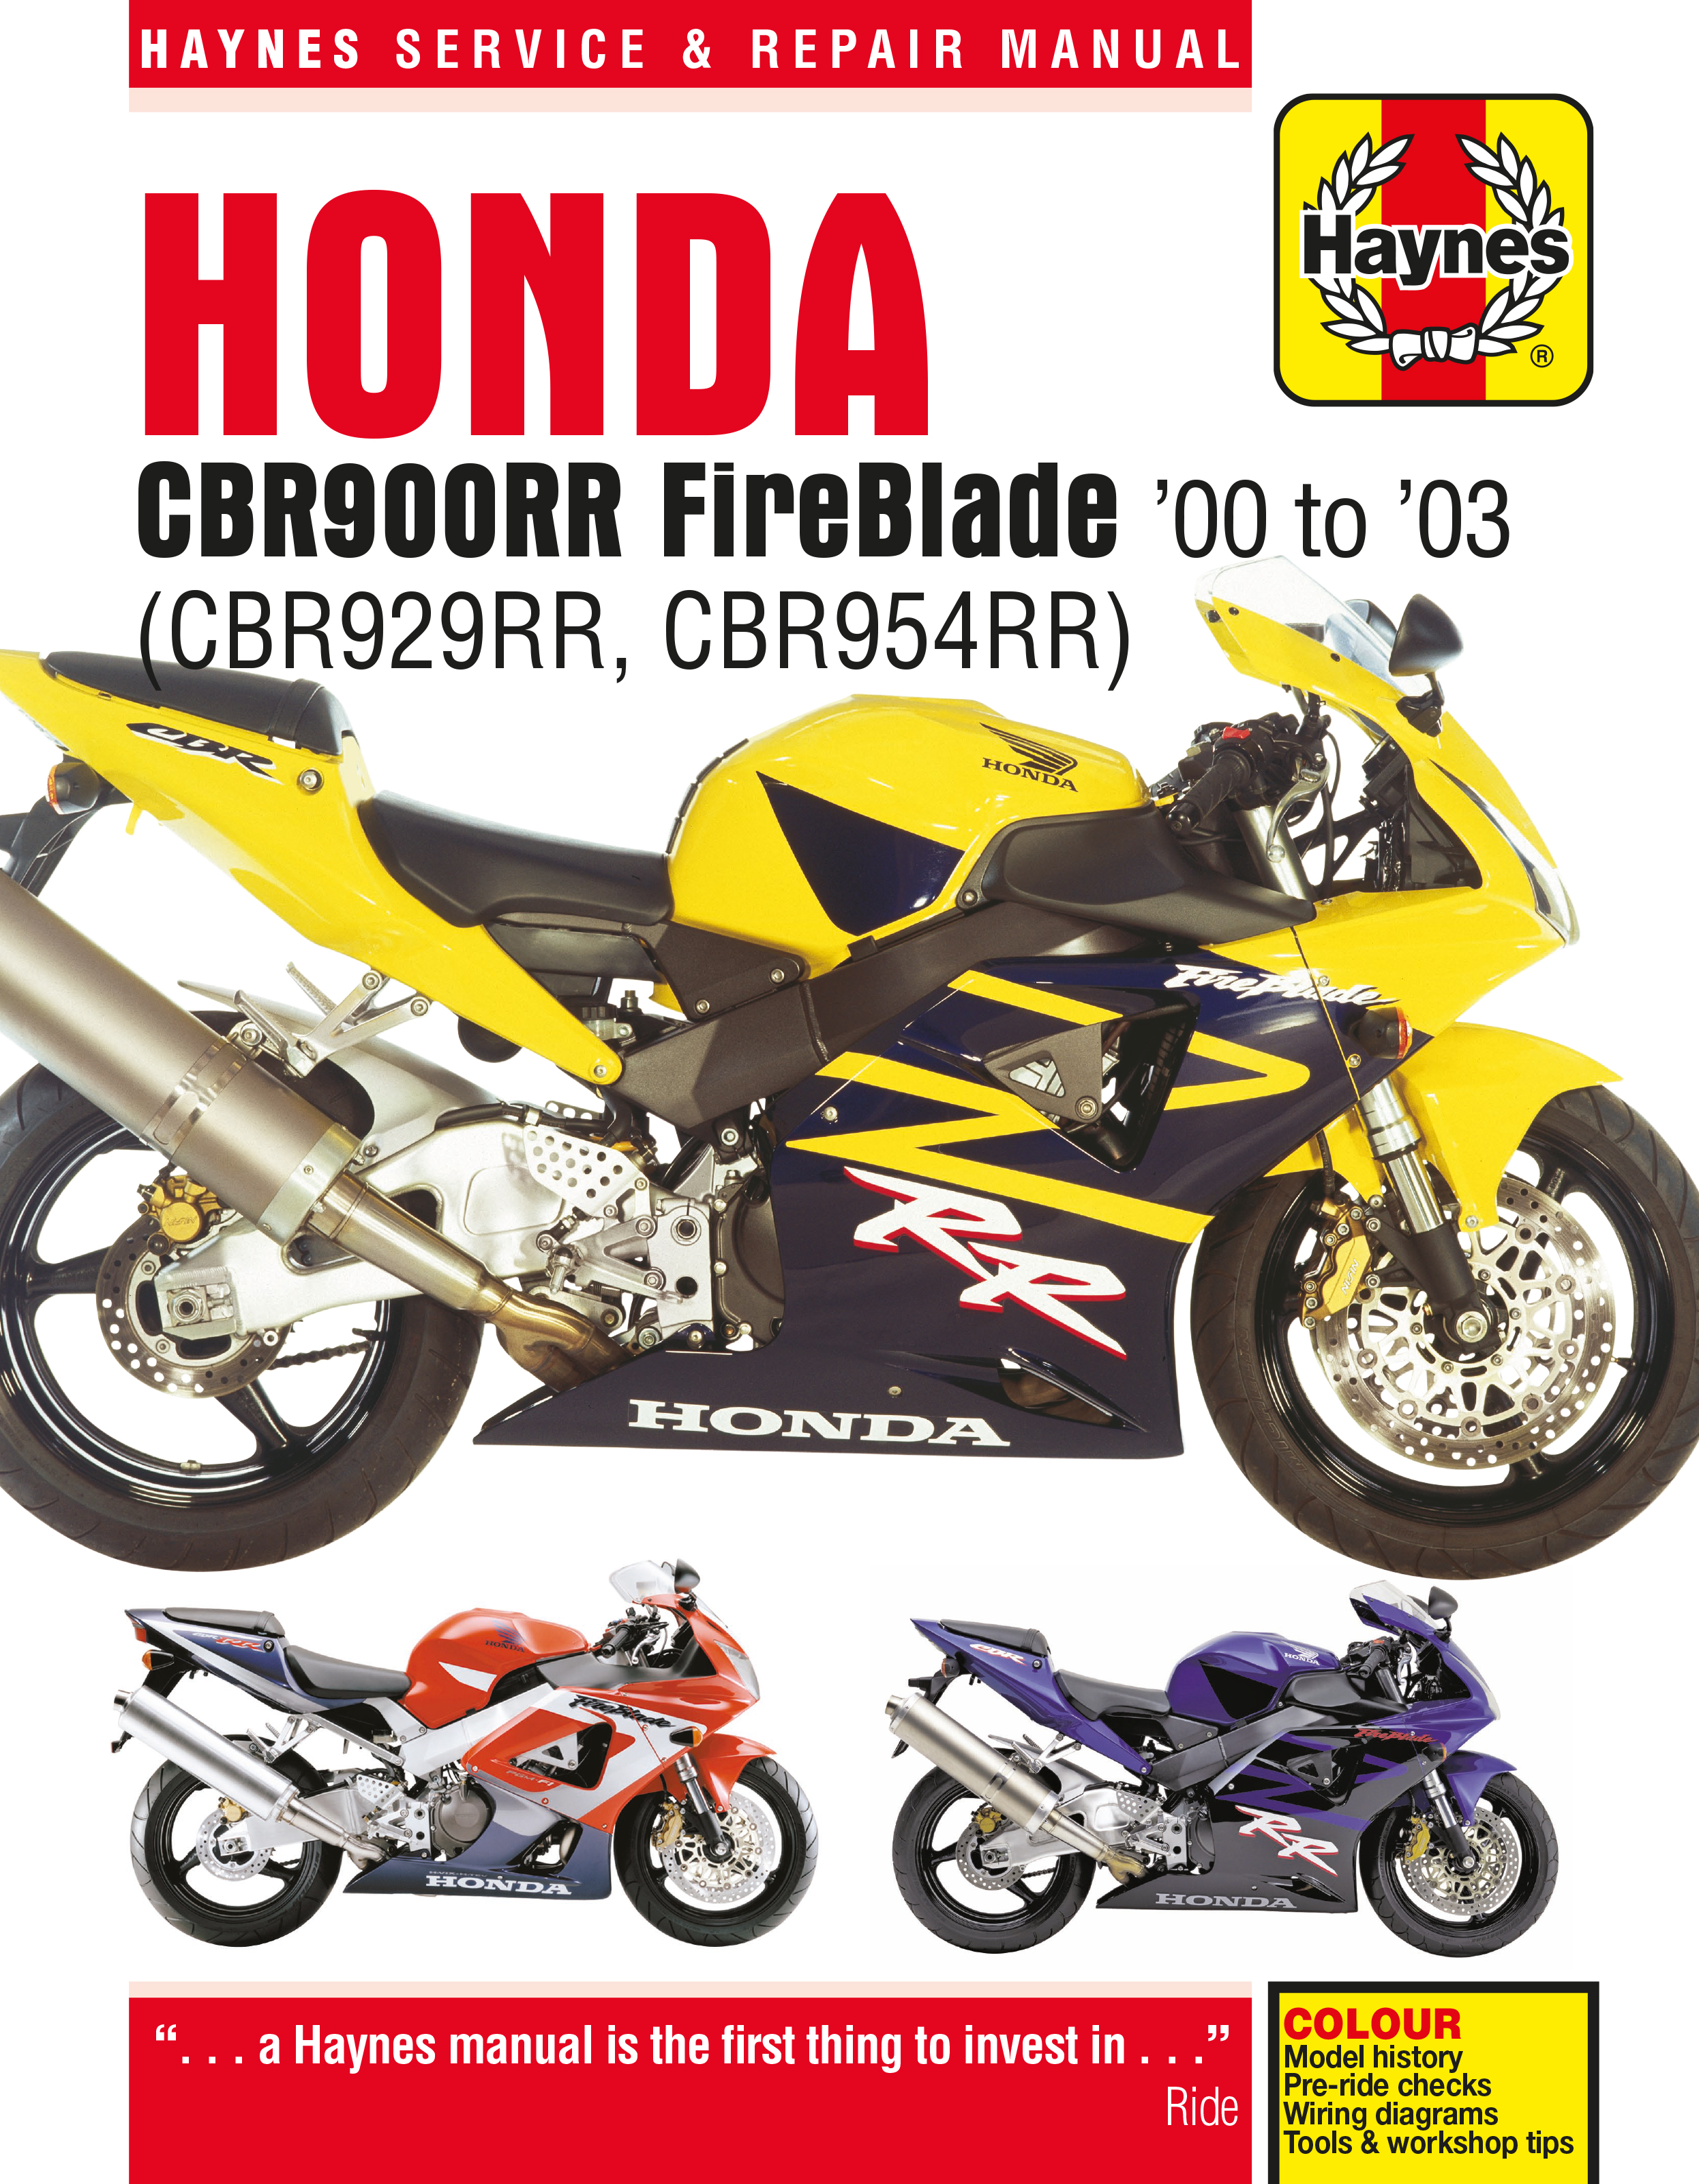 Honda CBR900RR FireBlade (00 - 03) Haynes Repair Manual